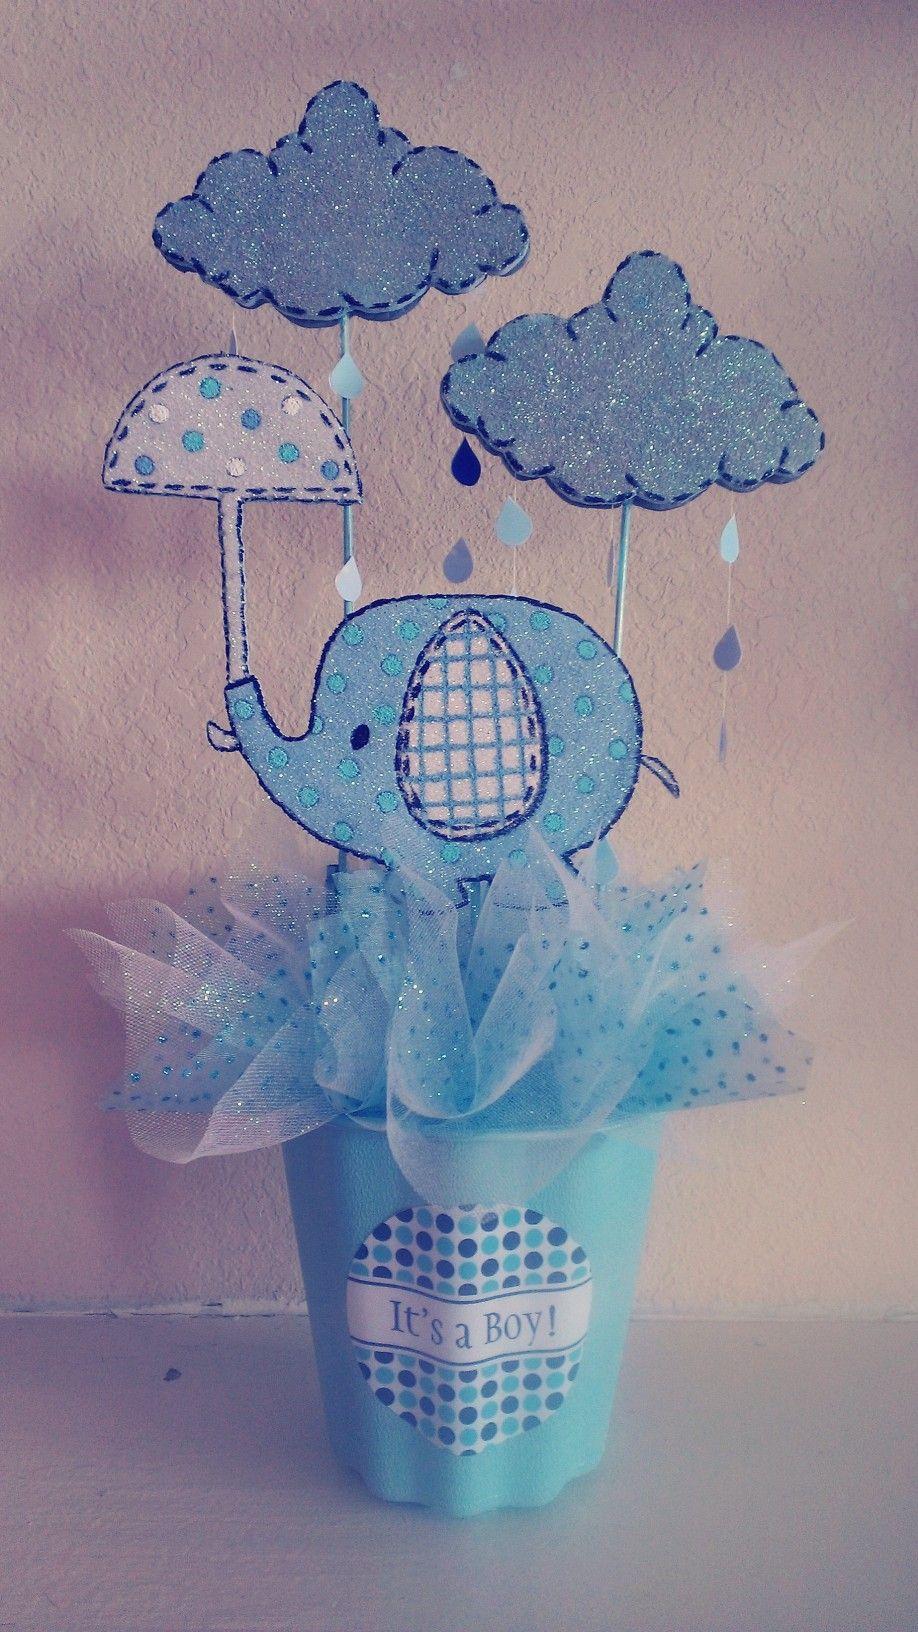 Elephant Umbrellaphant Baby Shower Centerpiece Girl Baby Shower Centerpieces Elephant Baby Shower Centerpieces Elephant Baby Shower Theme